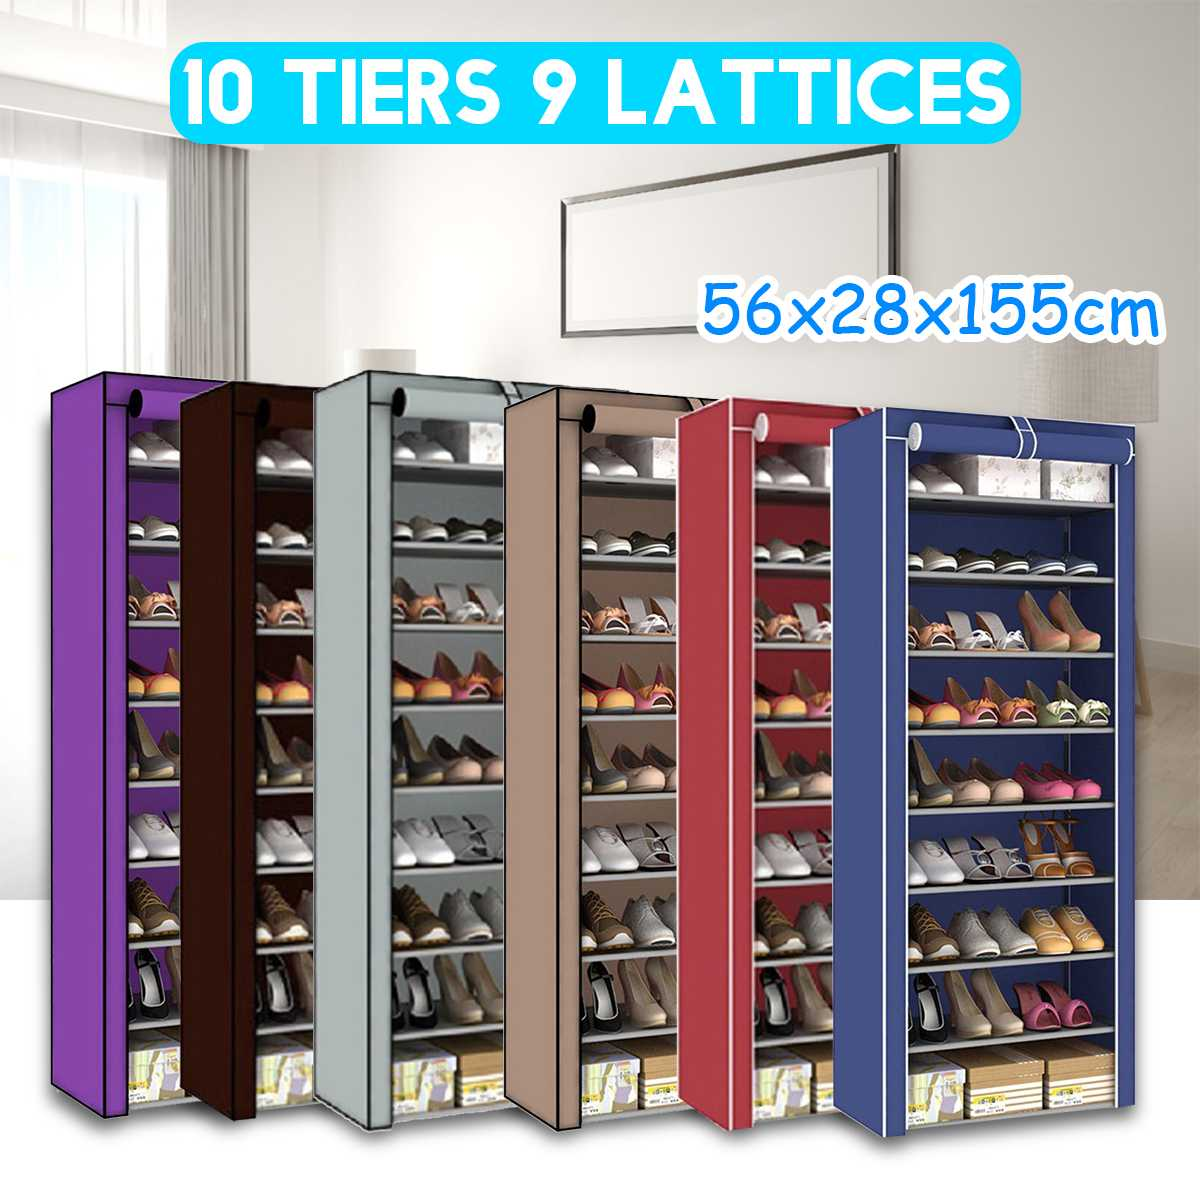 9 Tier Shoe Rack Dust-proof Shoe Cabinet Folding Non-woven Cloth Shoe Storage Stand Holder DIY Assembly Shoe Organizer Rack